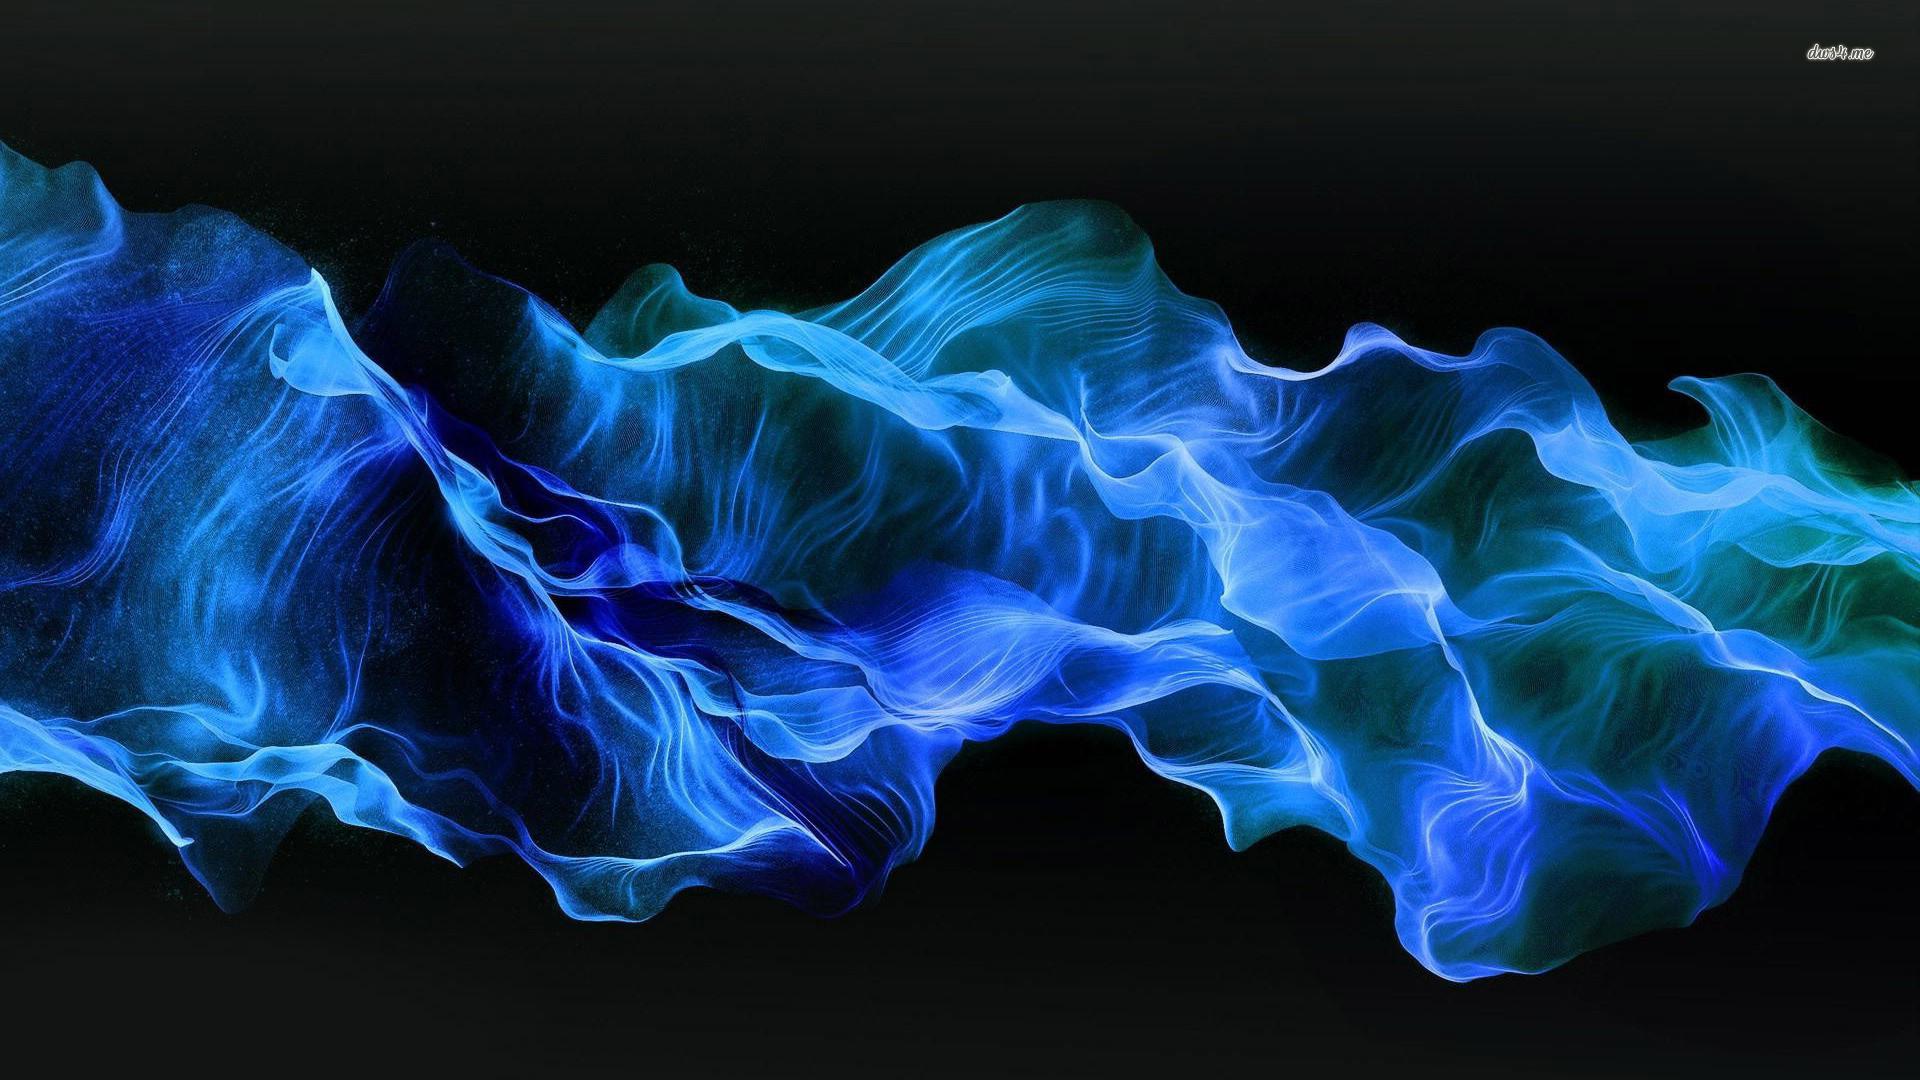 Blue smoke wallpaper – Abstract wallpapers – #12627